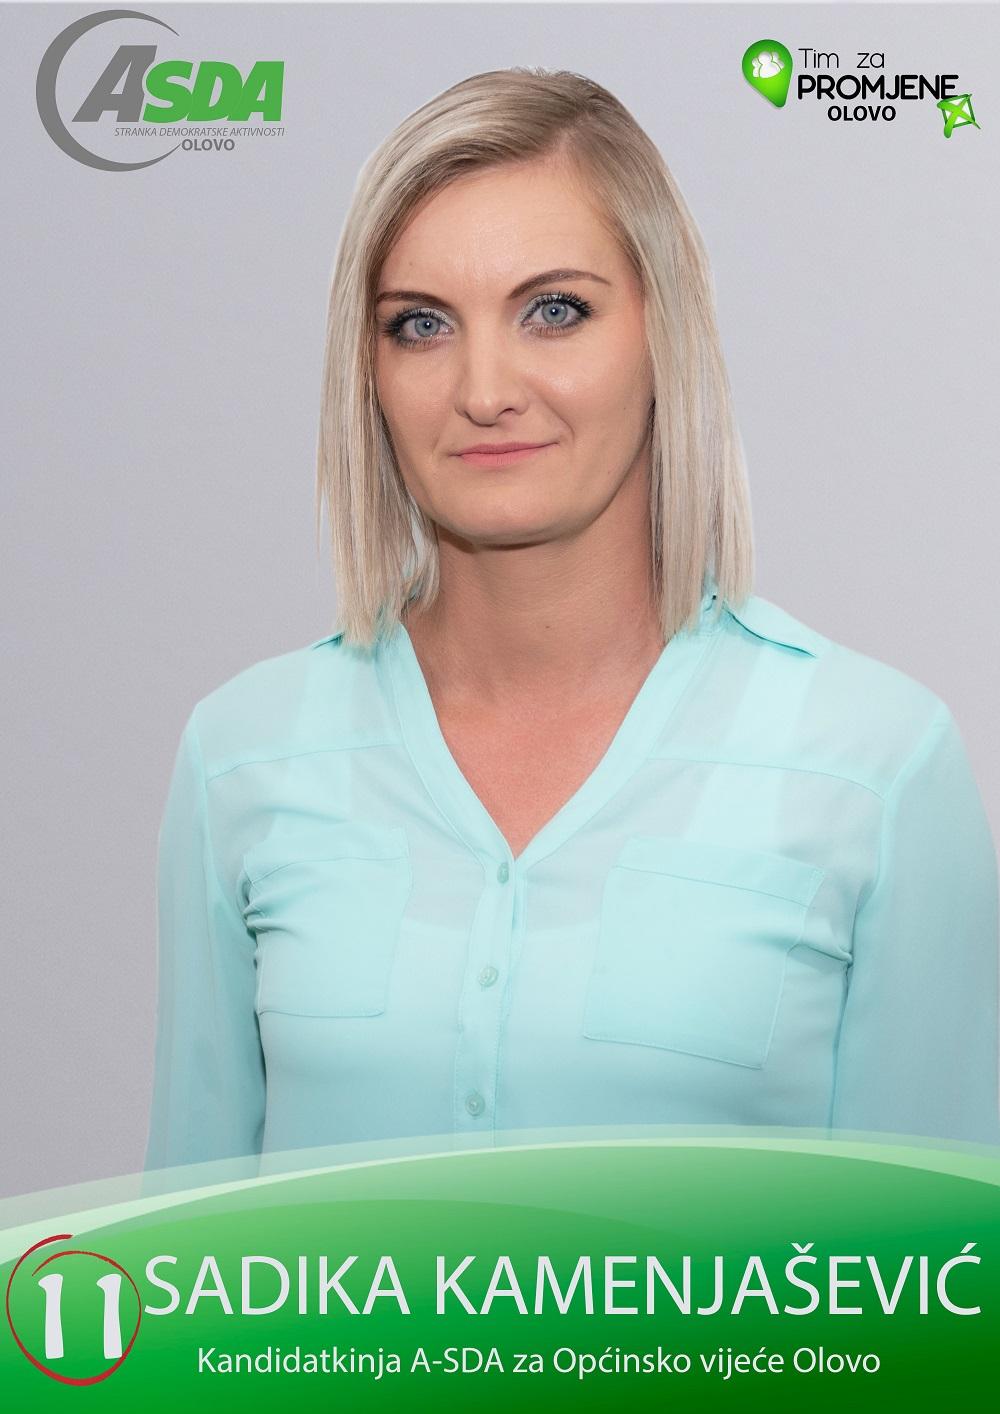 Sadika Kamenjašević